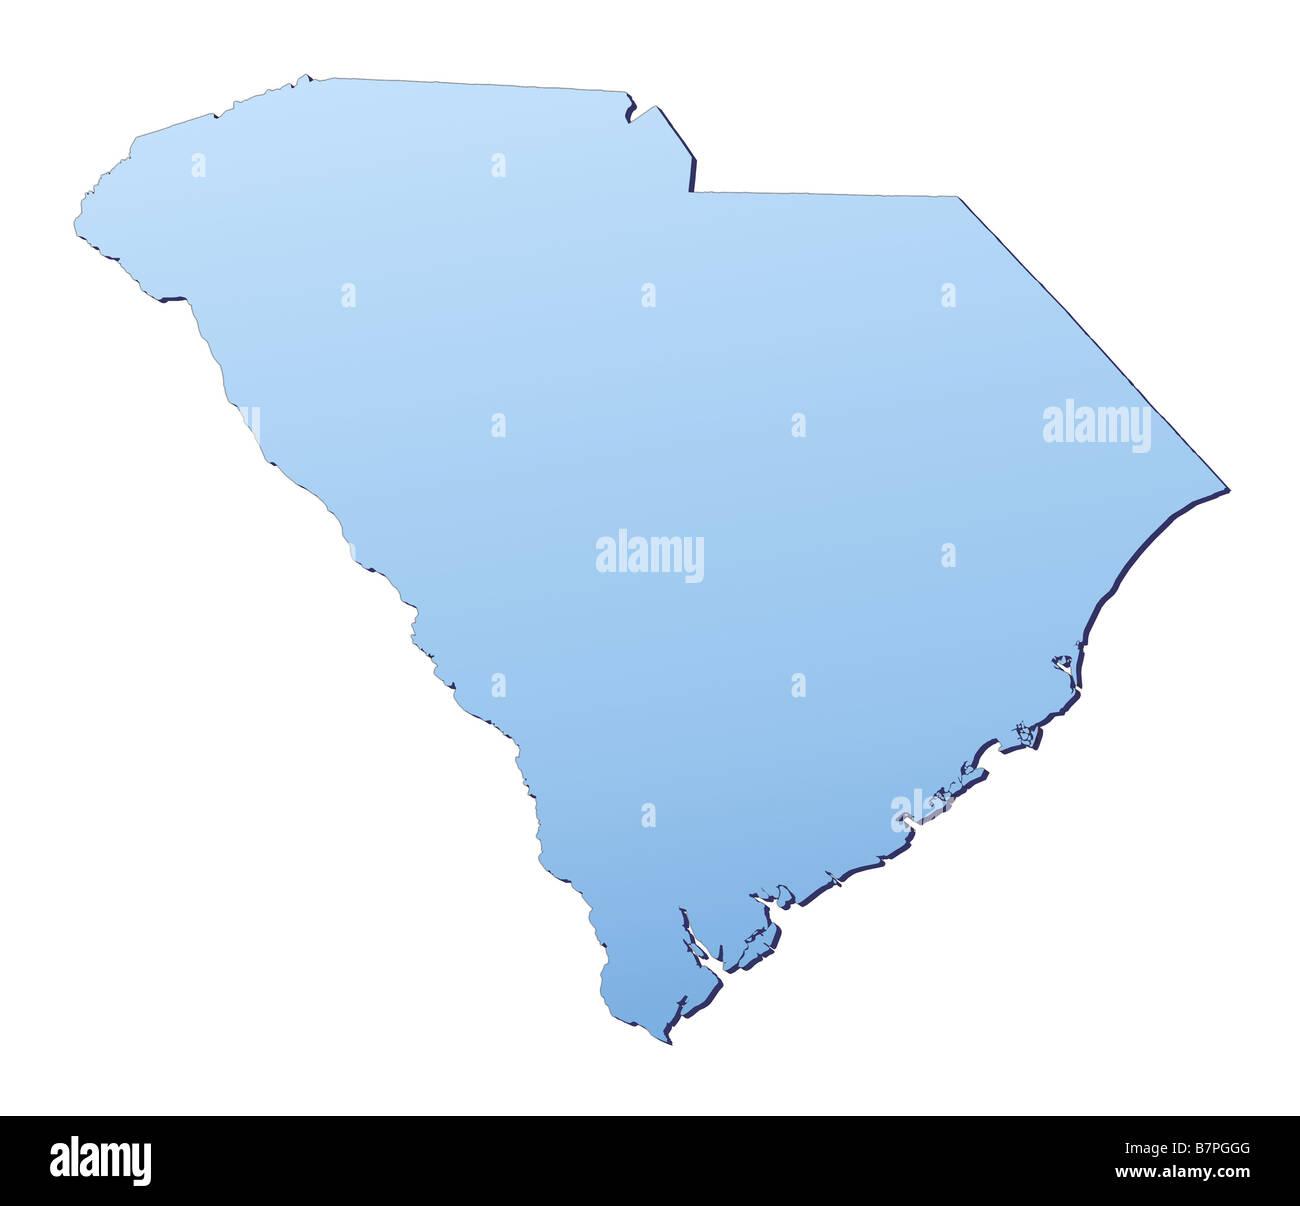 South Carolina Map Stock Photo 22008912 Alamy